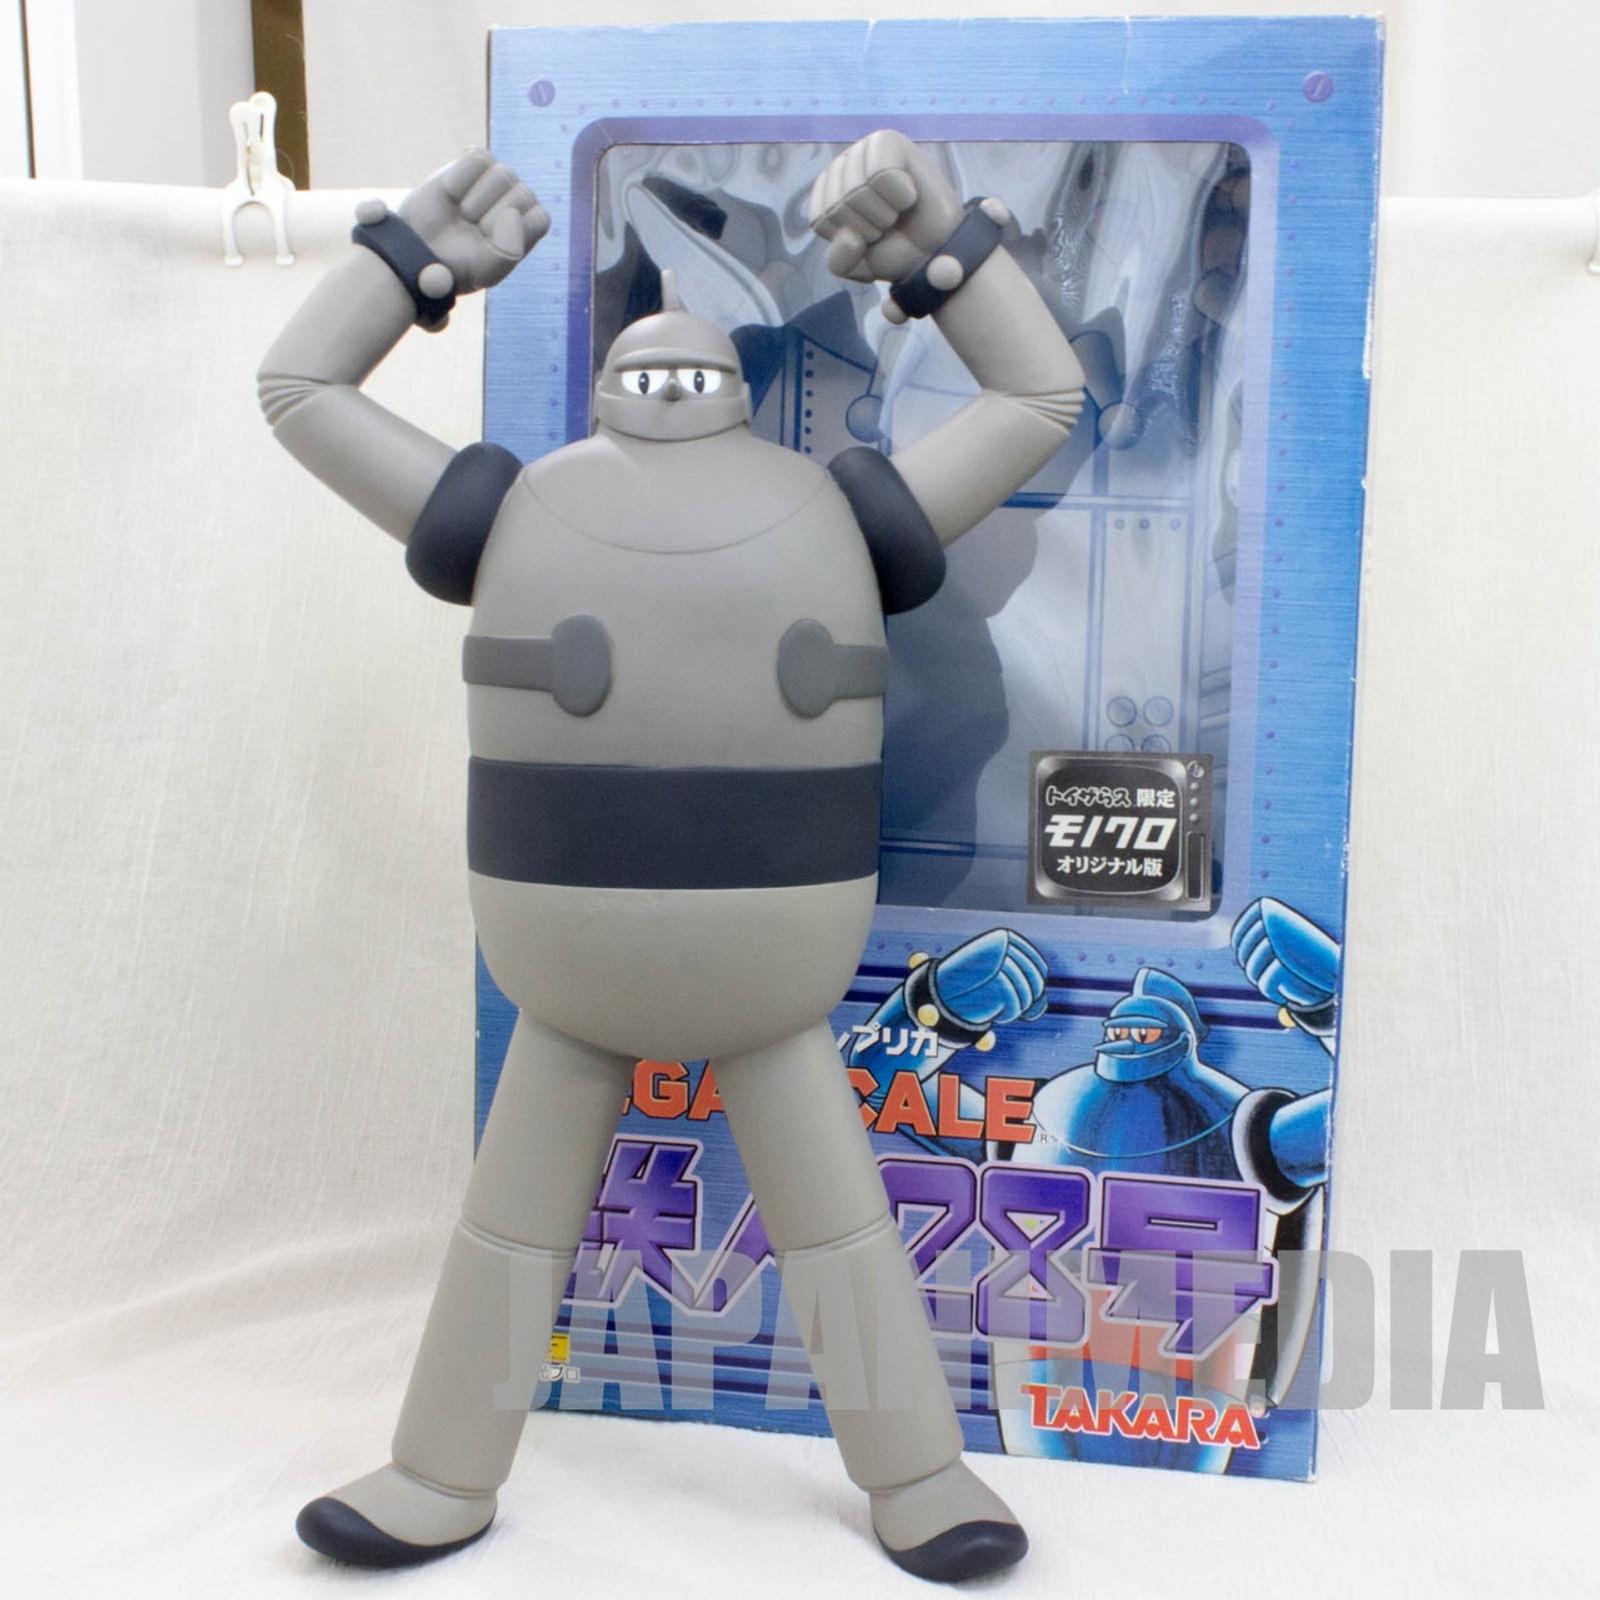 Tetsujin 28 Gigantor Mega Scale 17â€_Figure Monochrome Ver. TAKARA JAPAN